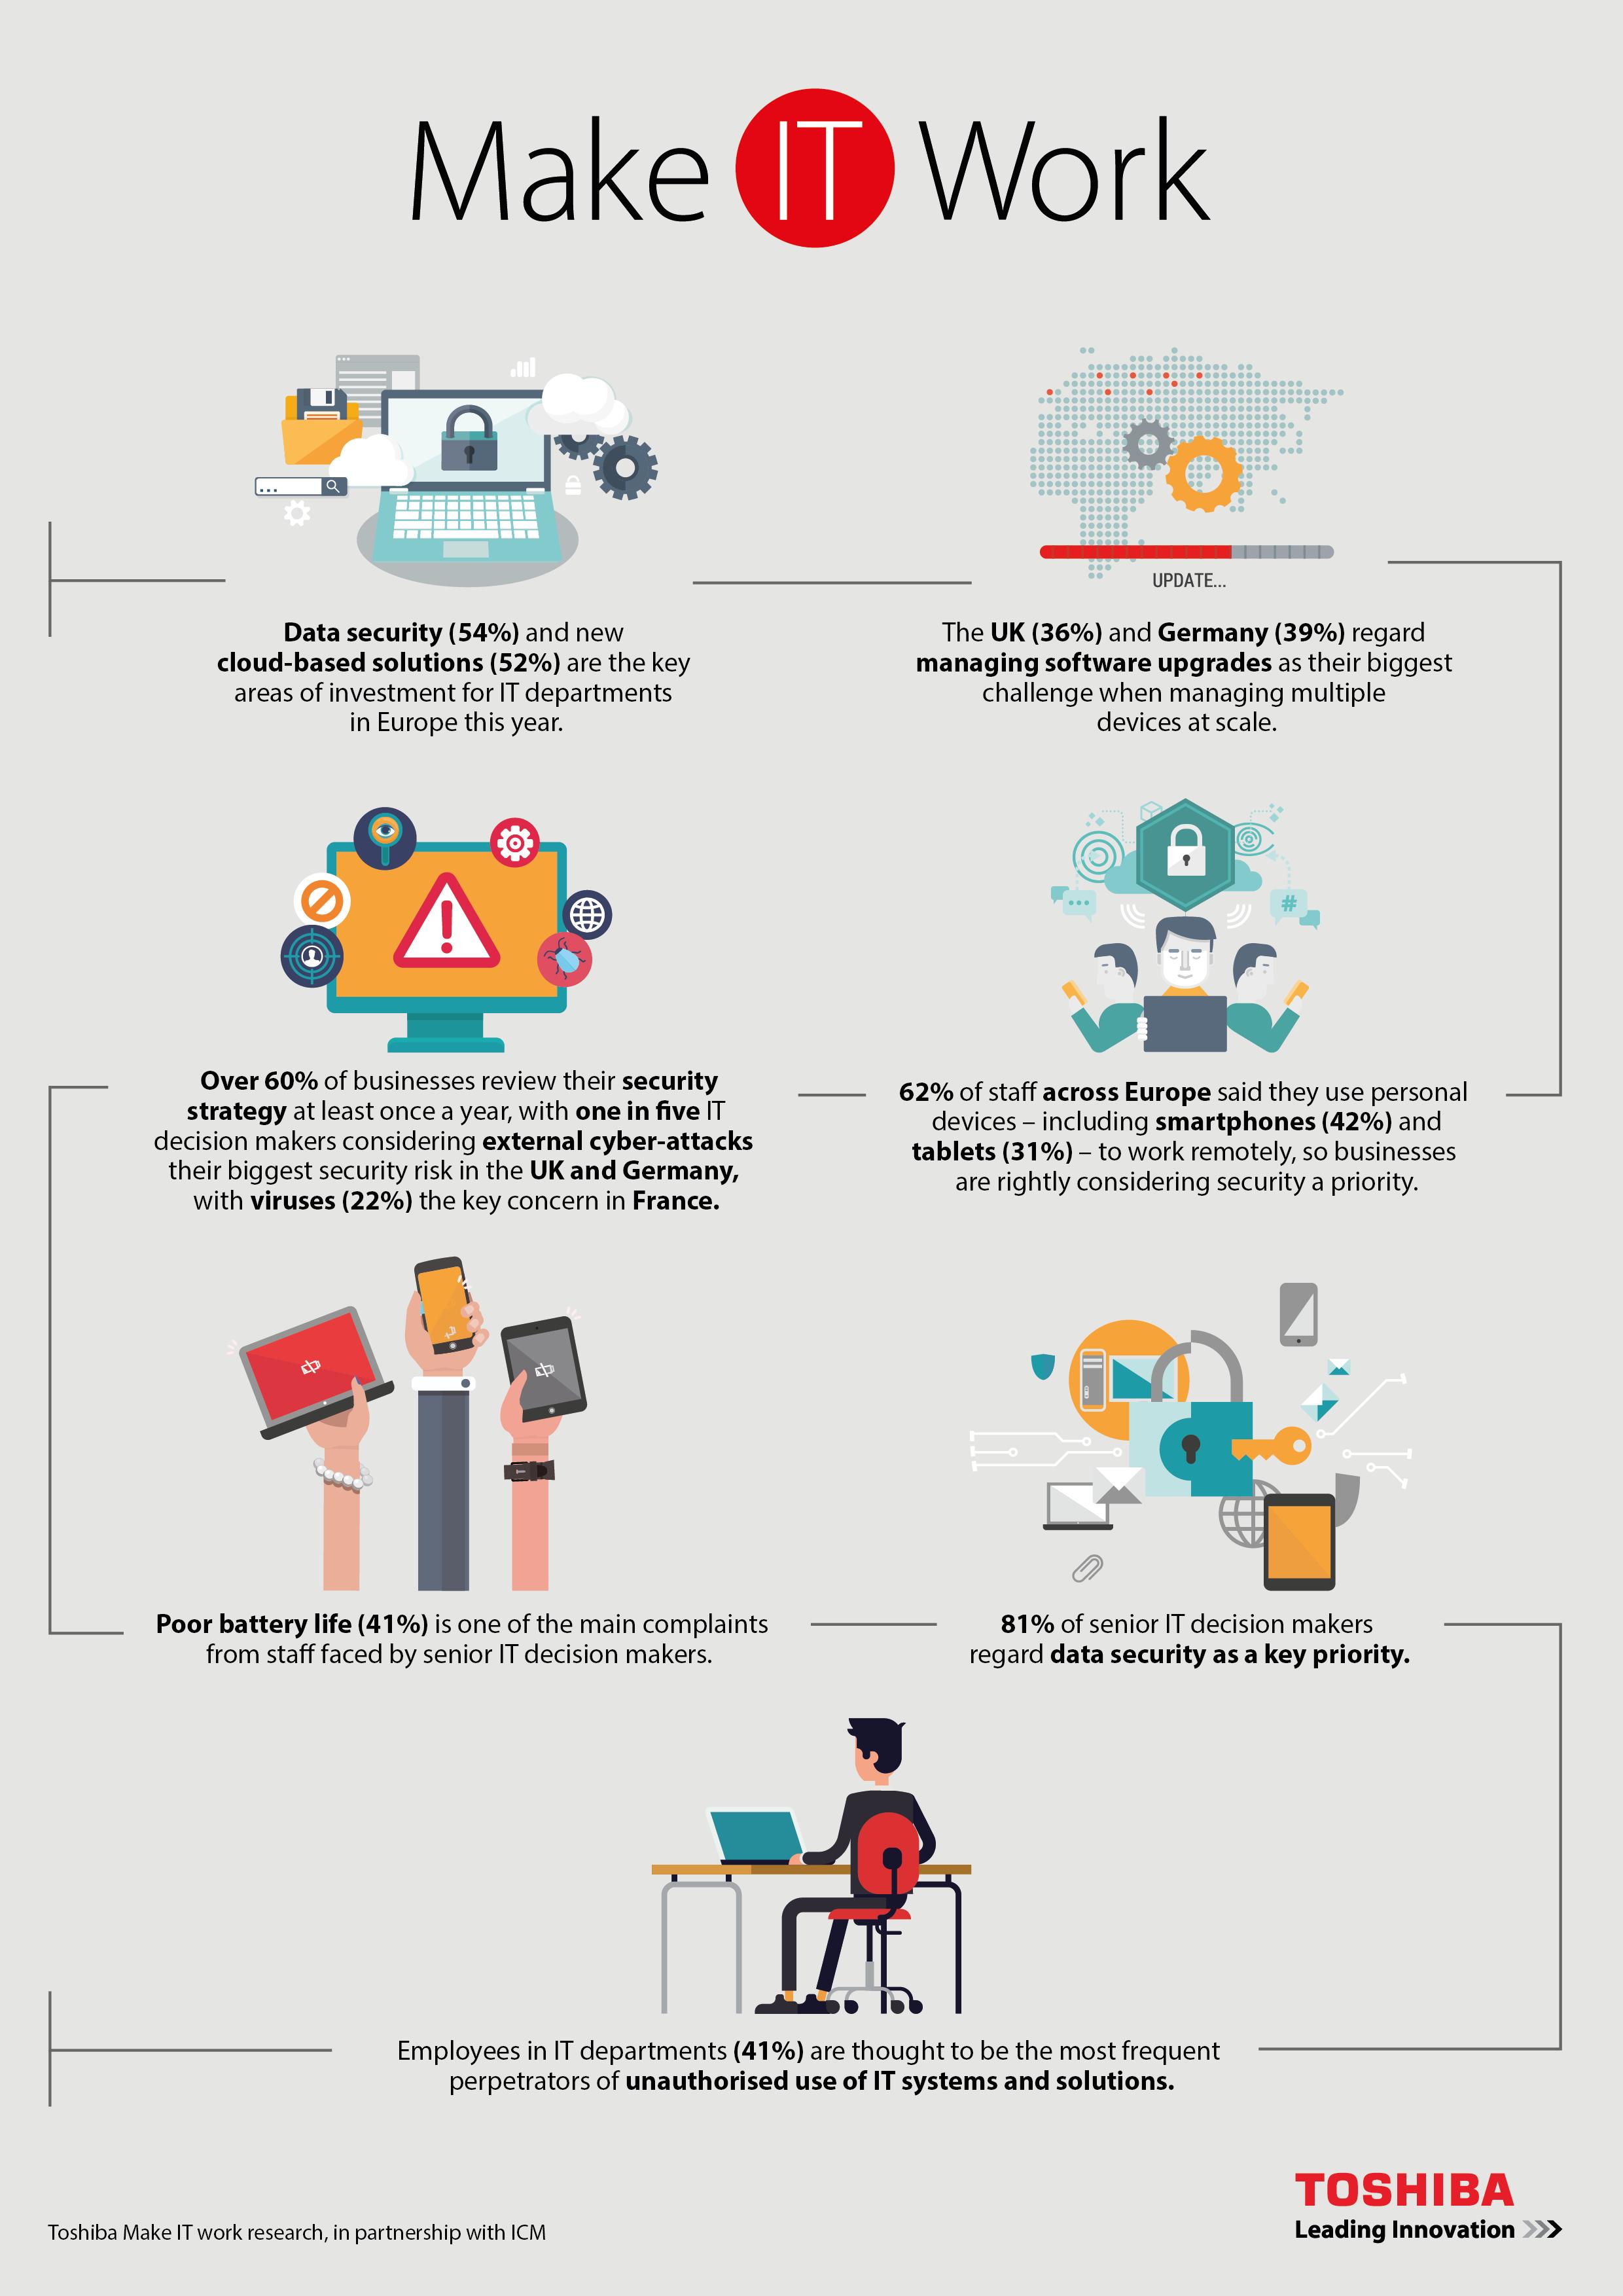 2016_05_19_Make IT work infographic